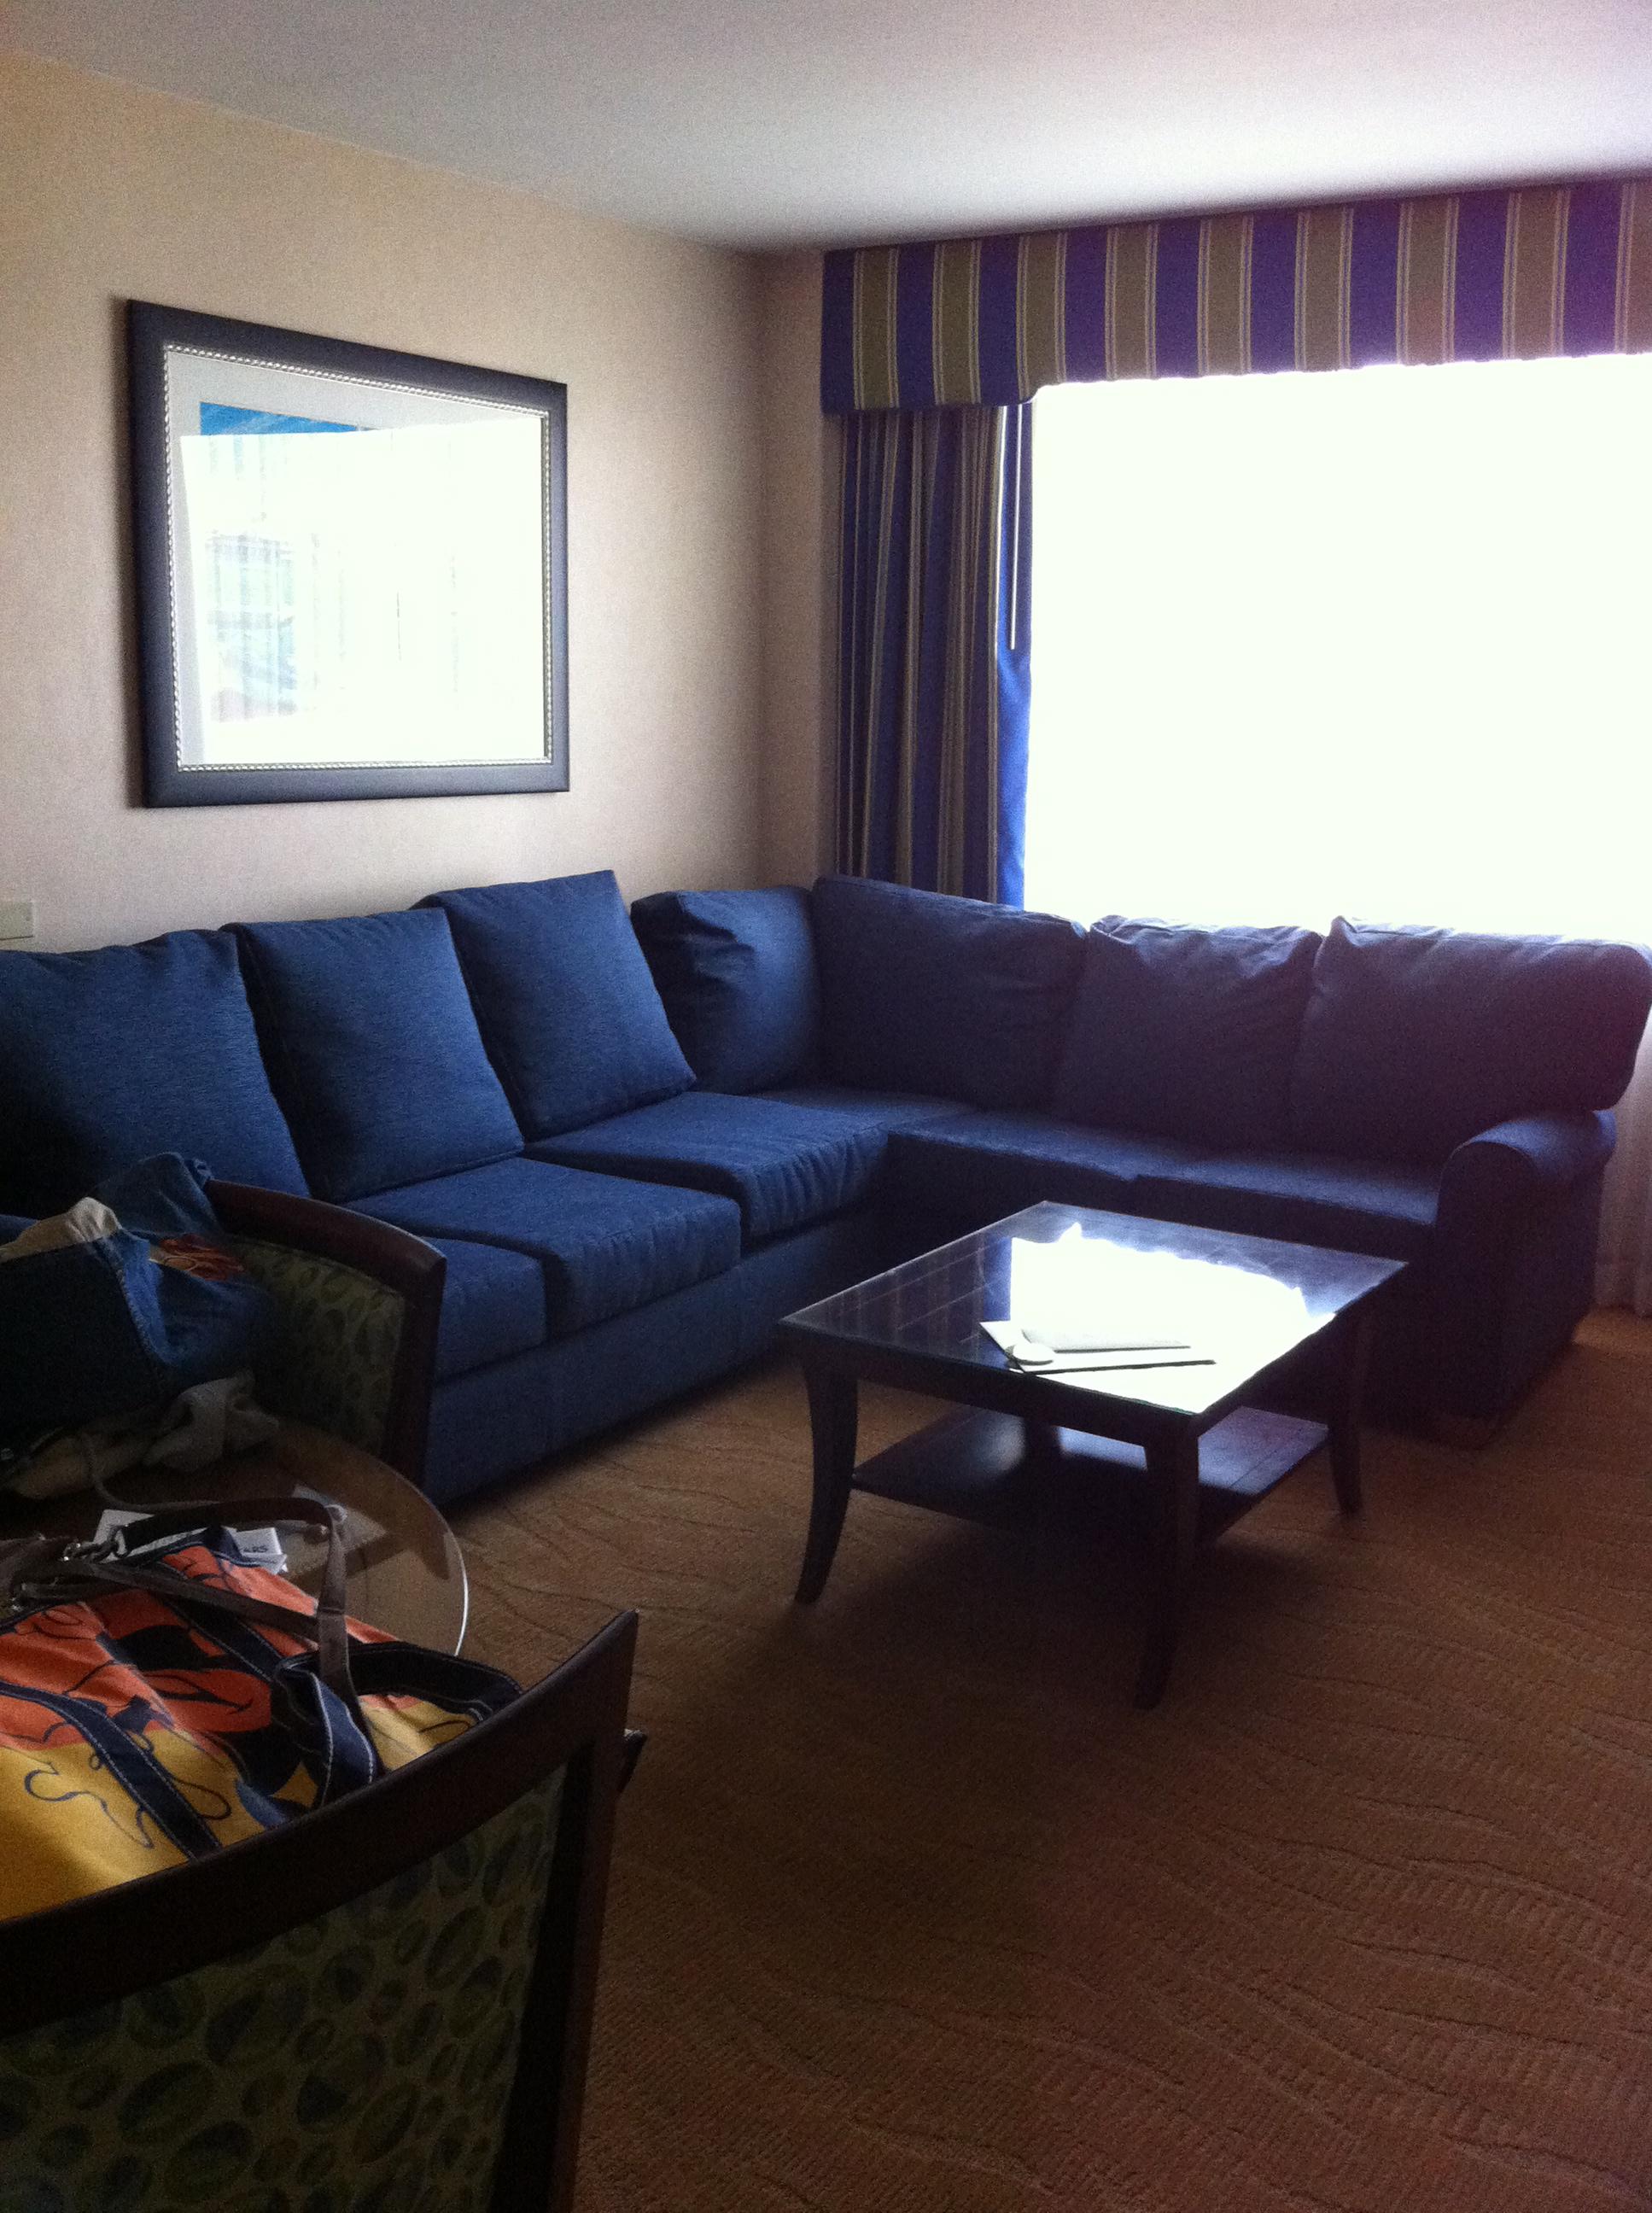 Sofa in Sitting Room